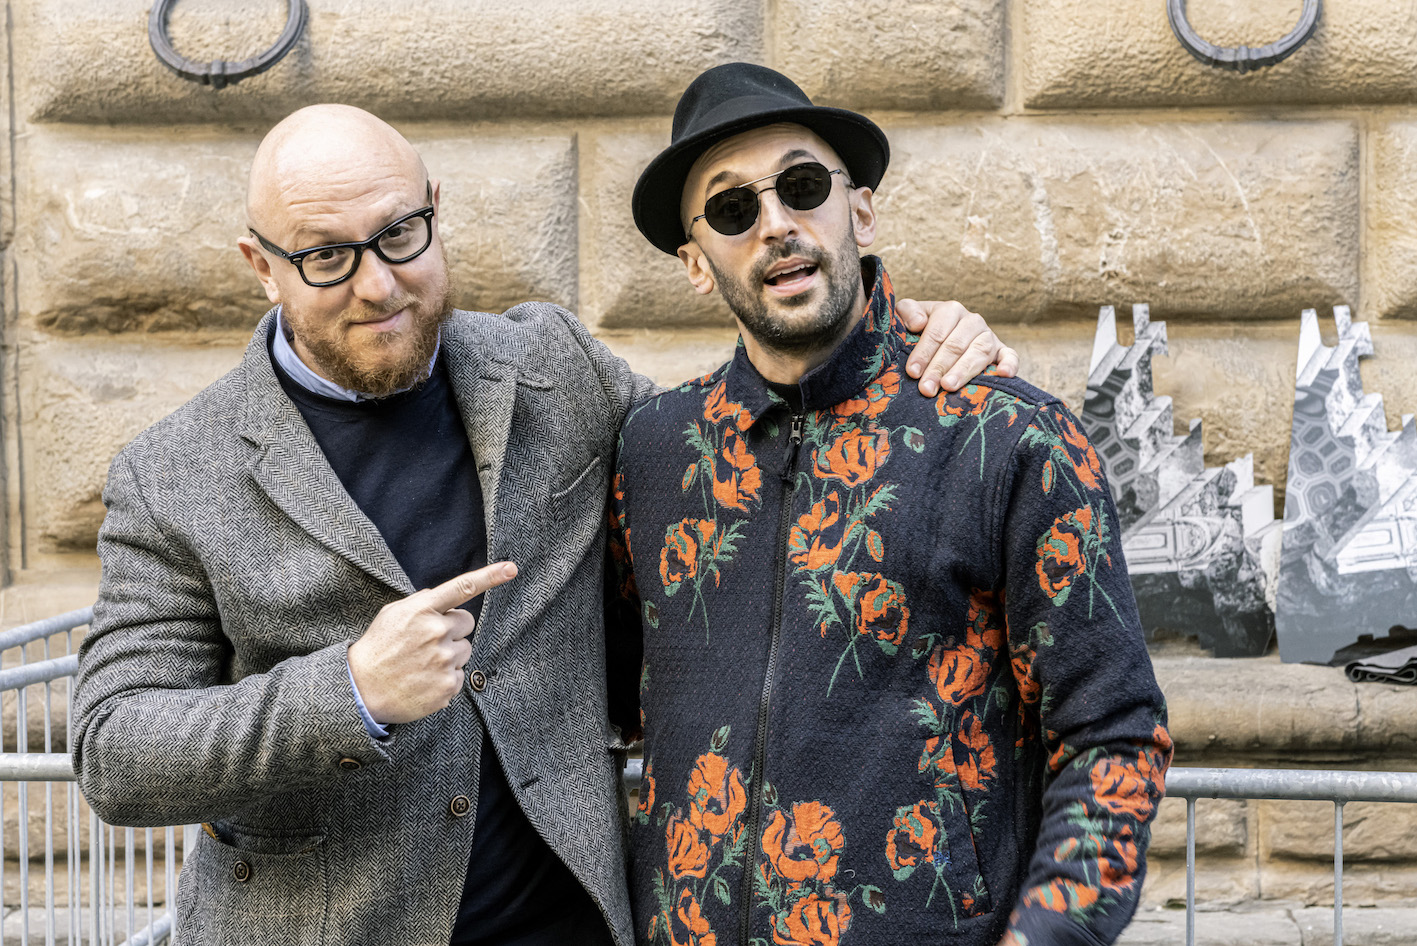 Arturo Galansino e JR davanti a Palazzo Strozzi. Photo Ela Bialkowska, OKNOstudio